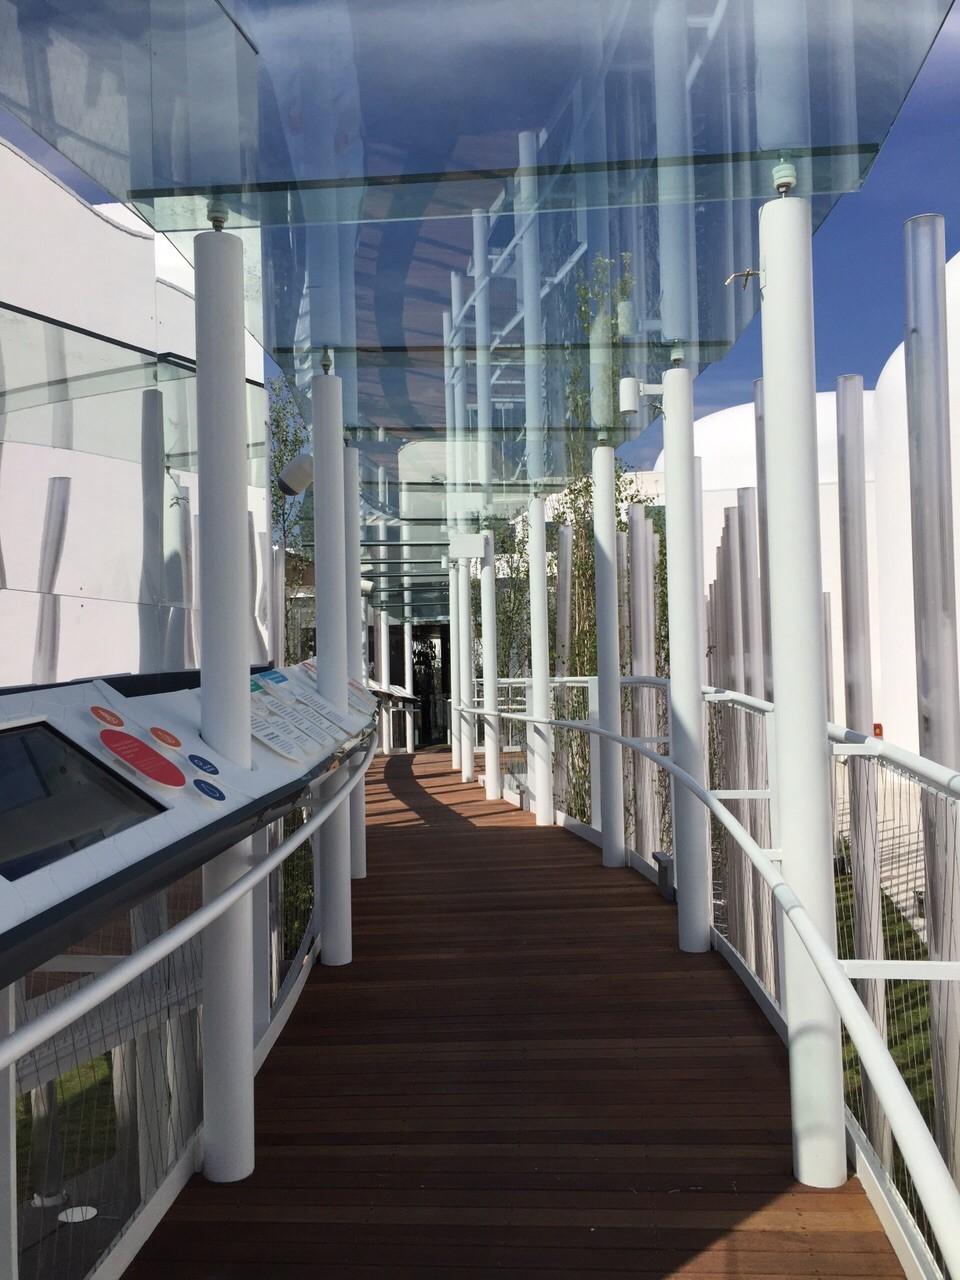 Expo 2015 Milan - Enel Pavilion